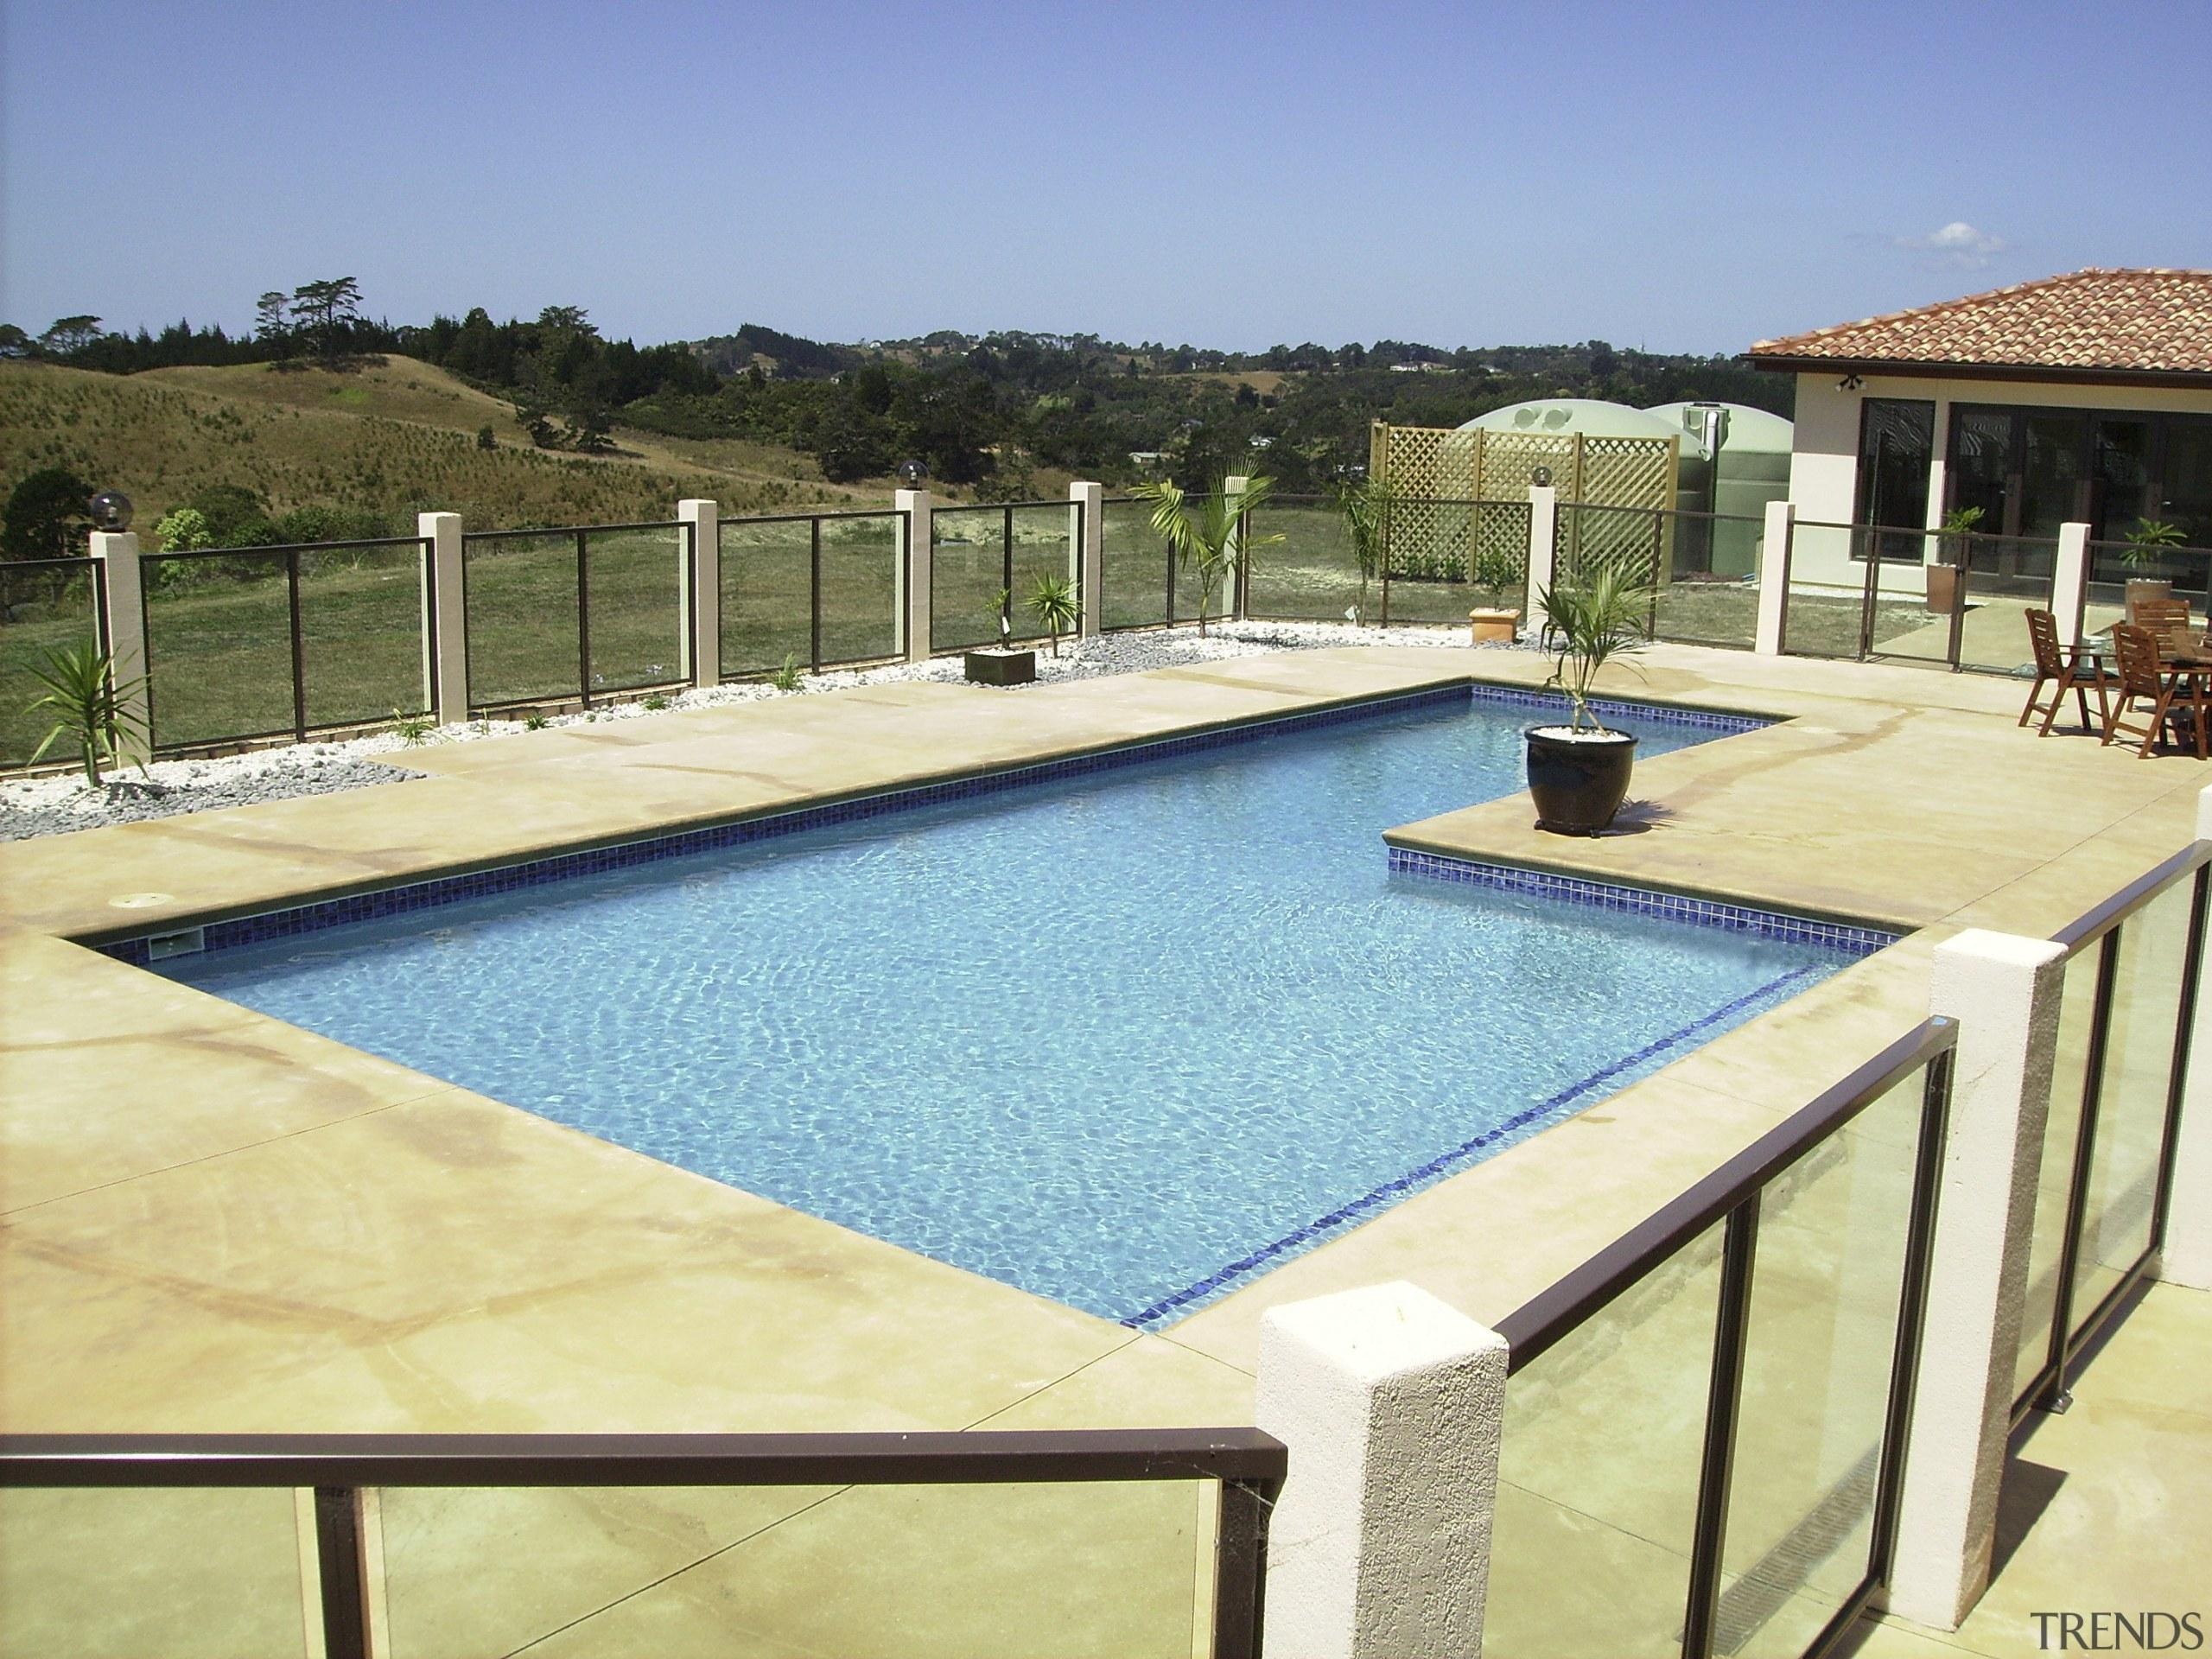 View of contemporary pool - View of contemporary leisure, property, real estate, resort, swimming pool, villa, yellow, teal